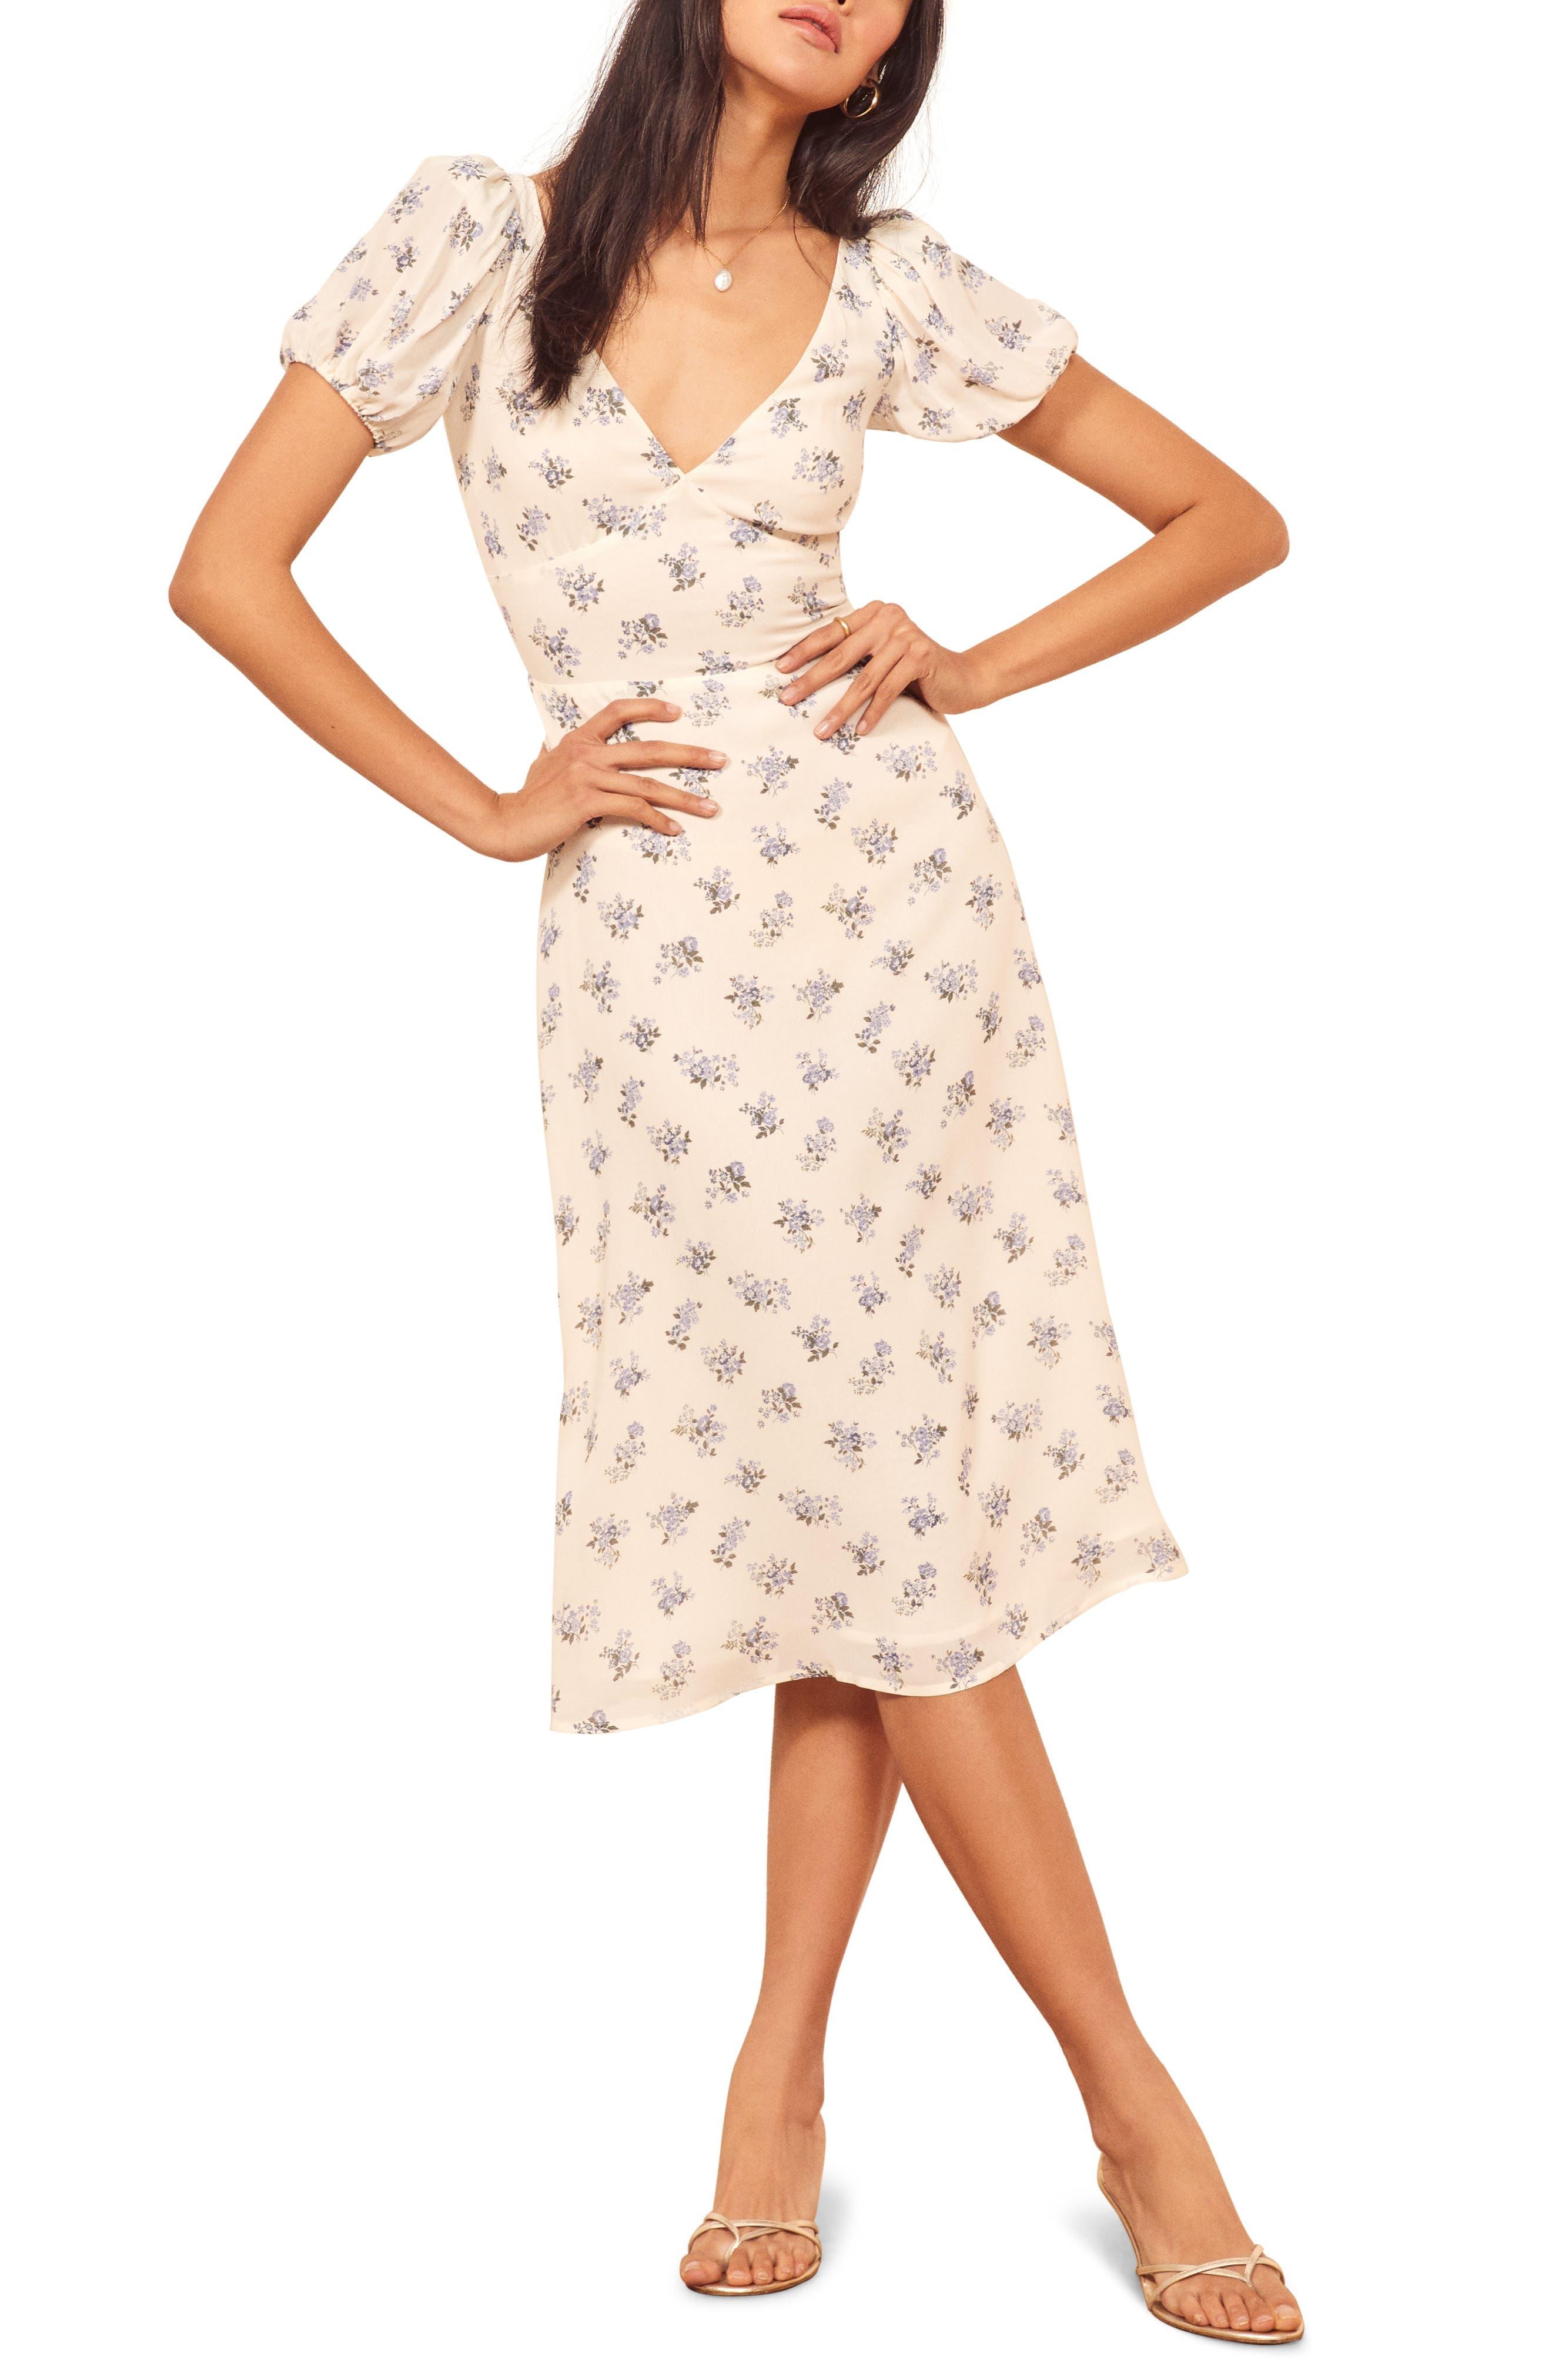 Reformation Kacey Print Puff Sleeve Midi Dress, White